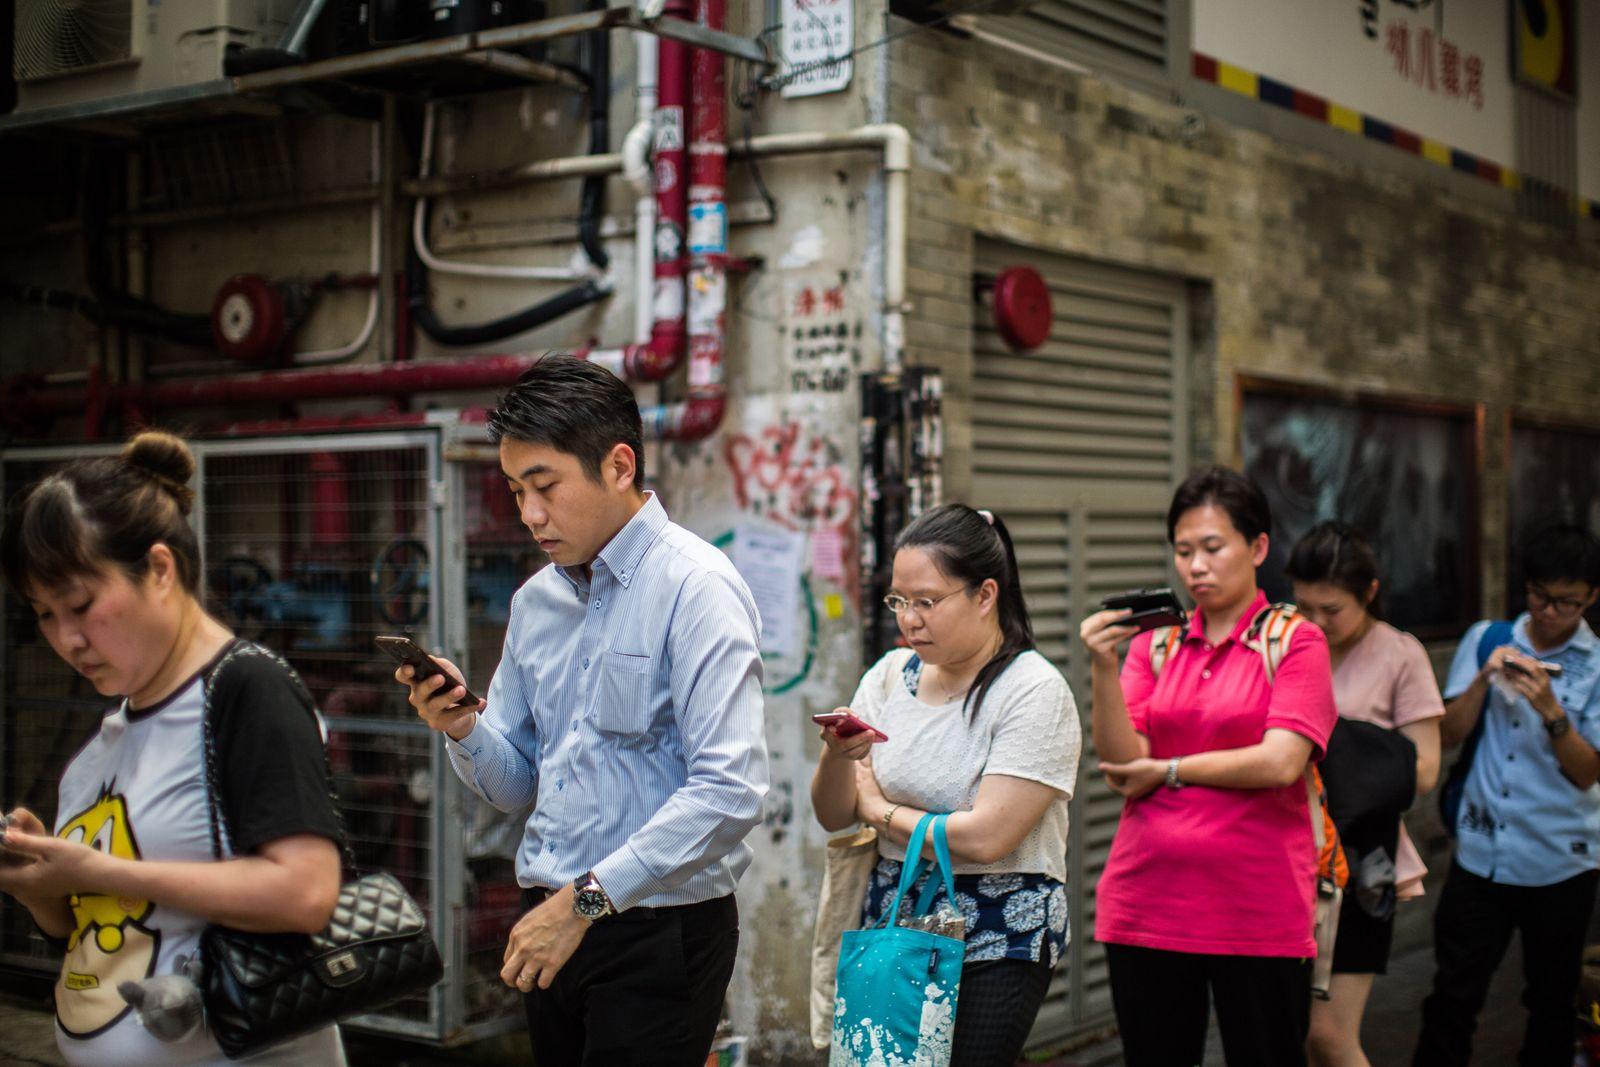 Chinesen Smartphone / Asiaten / Handy